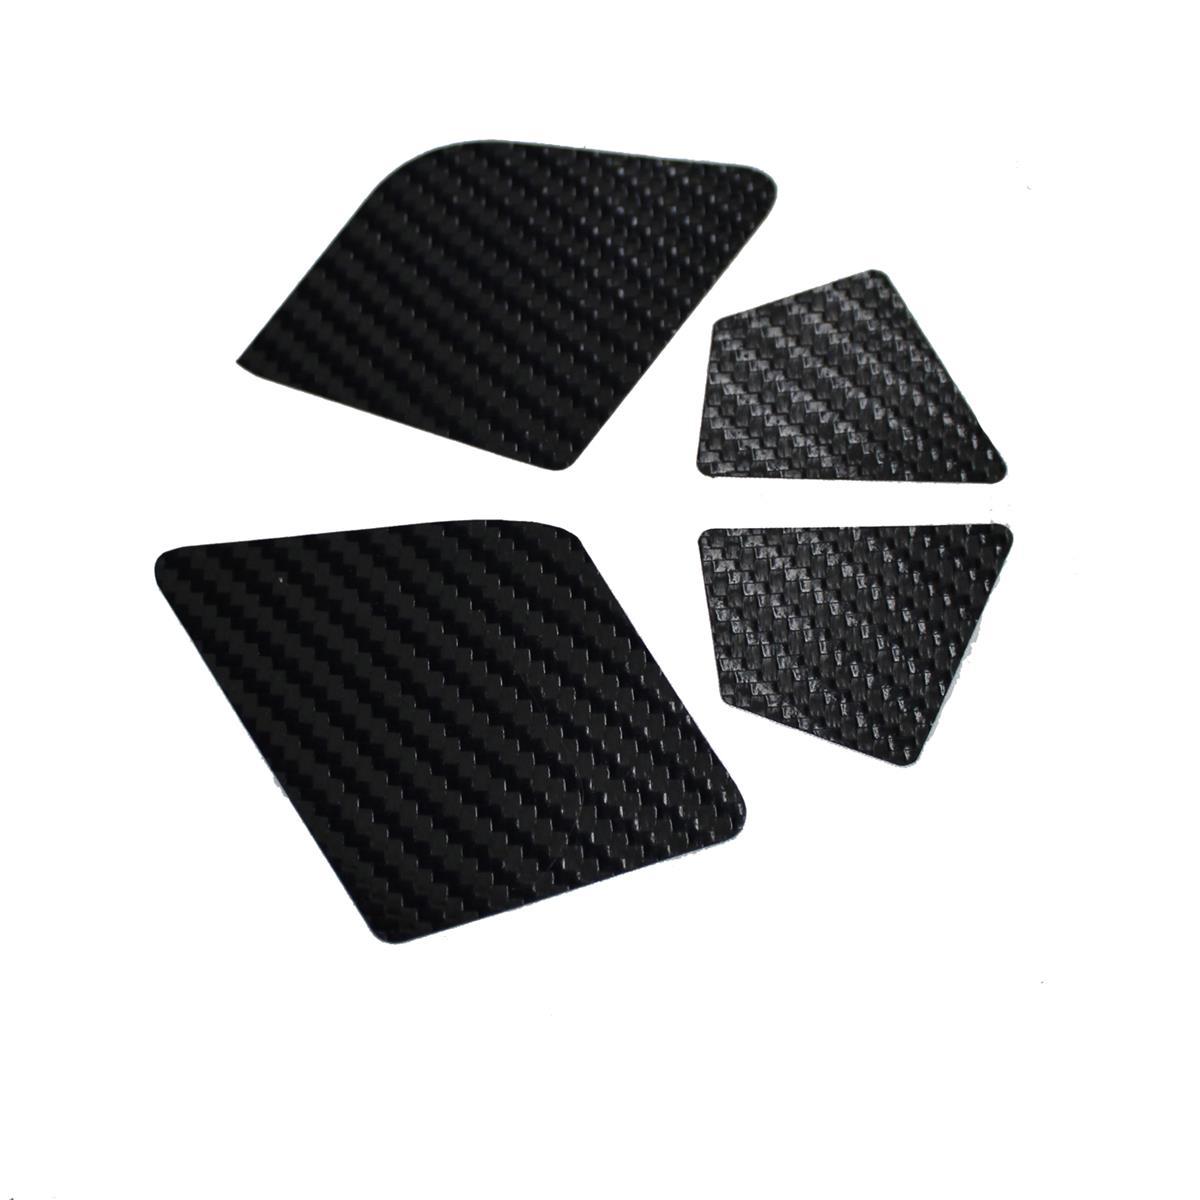 Coppia adesivi di ricambio carter Integra XF1 Carbon 160mm 2019